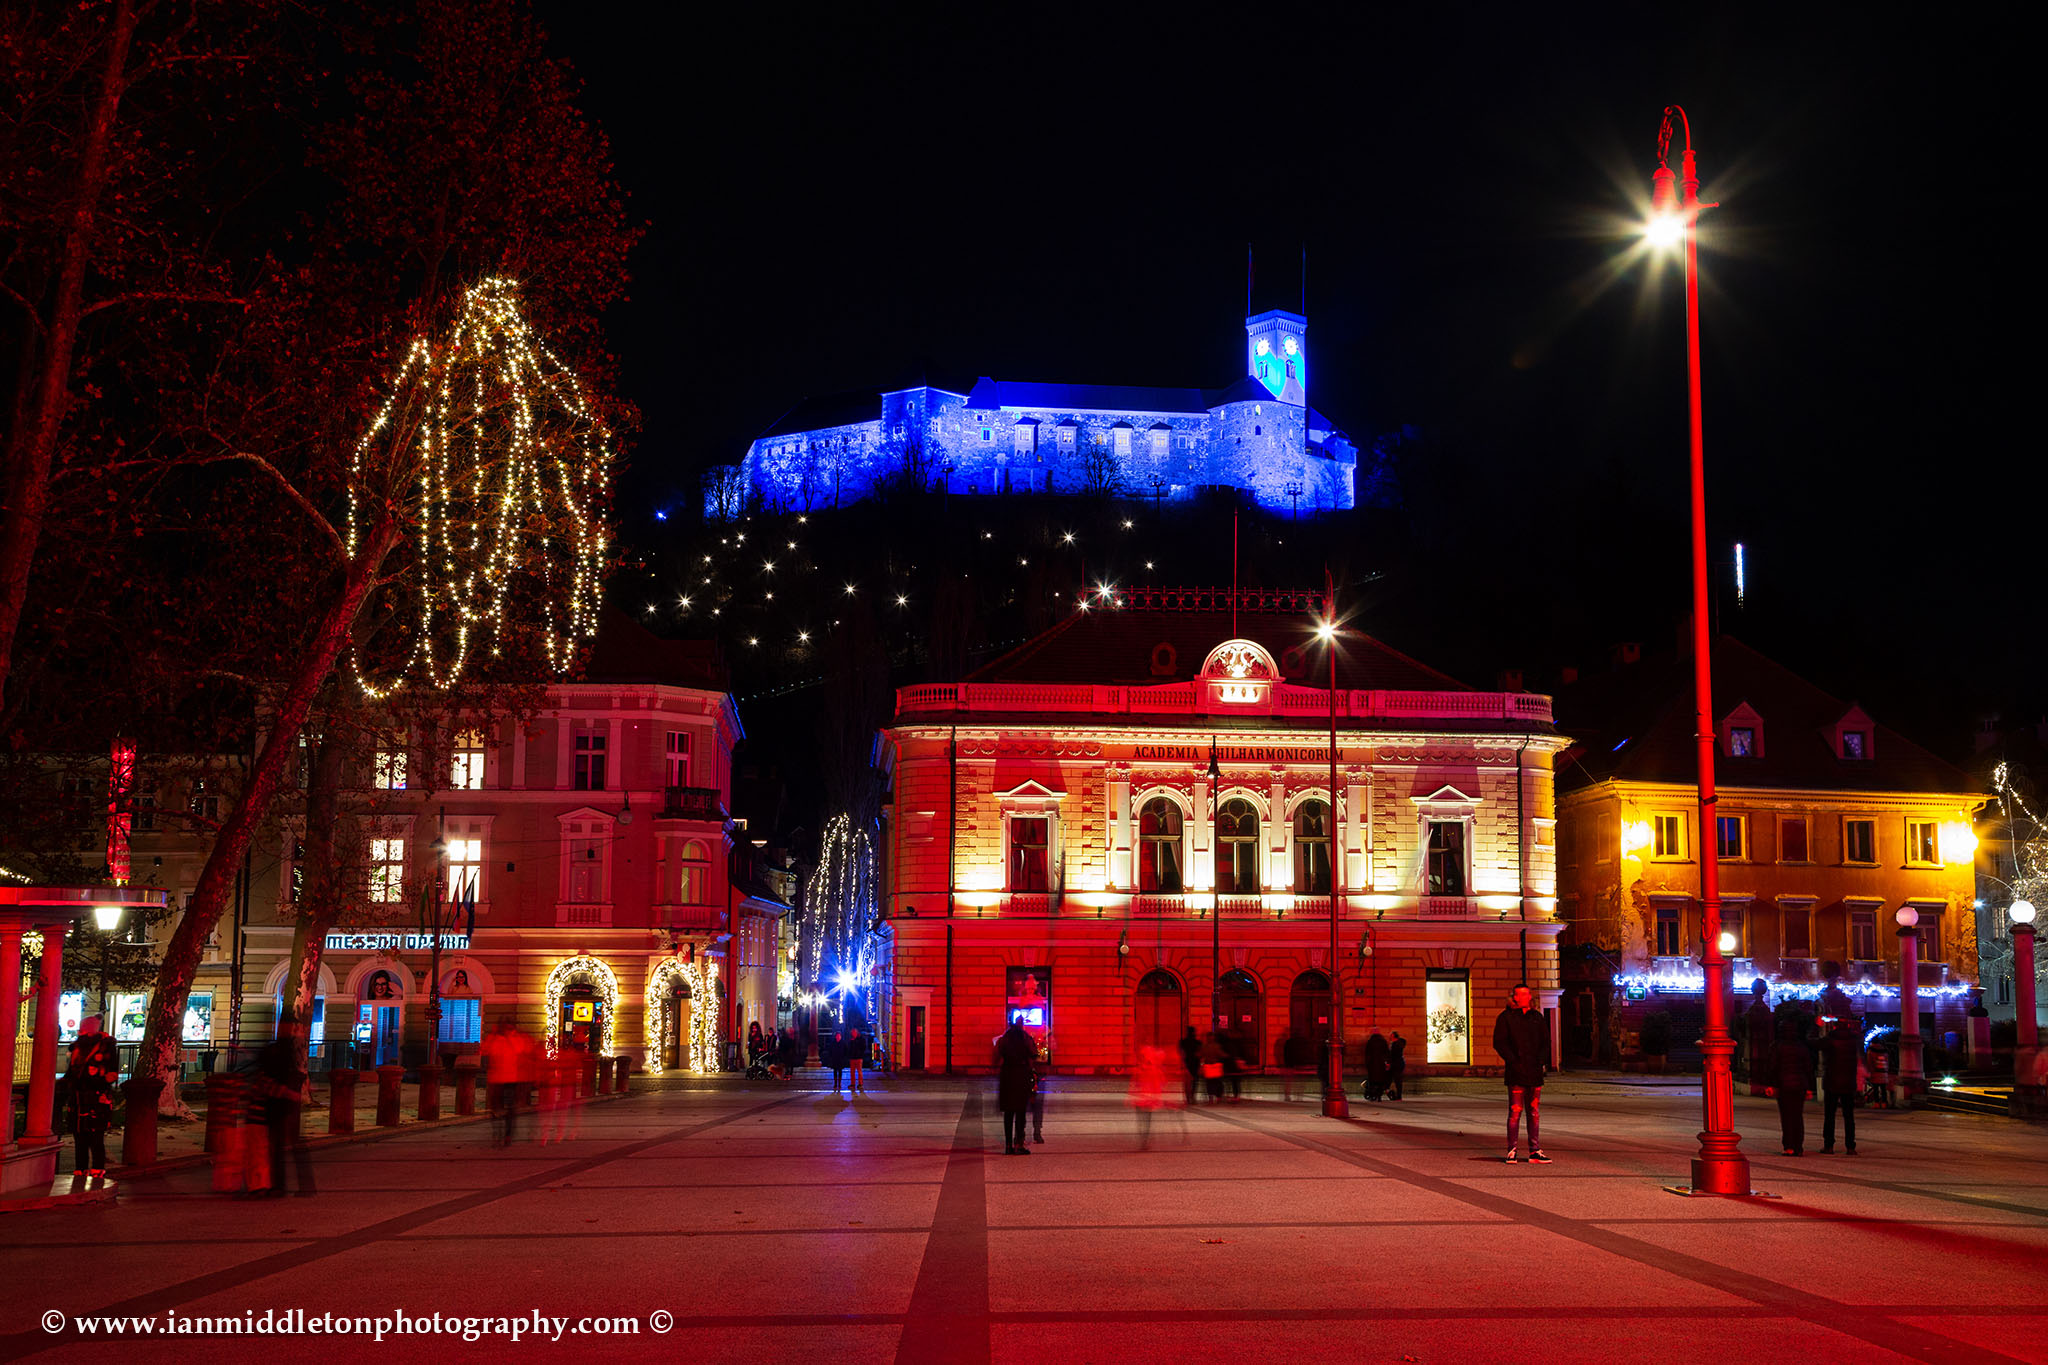 Christmas in Kongresni Square with view of the castle in Ljubljana, Slovenia.